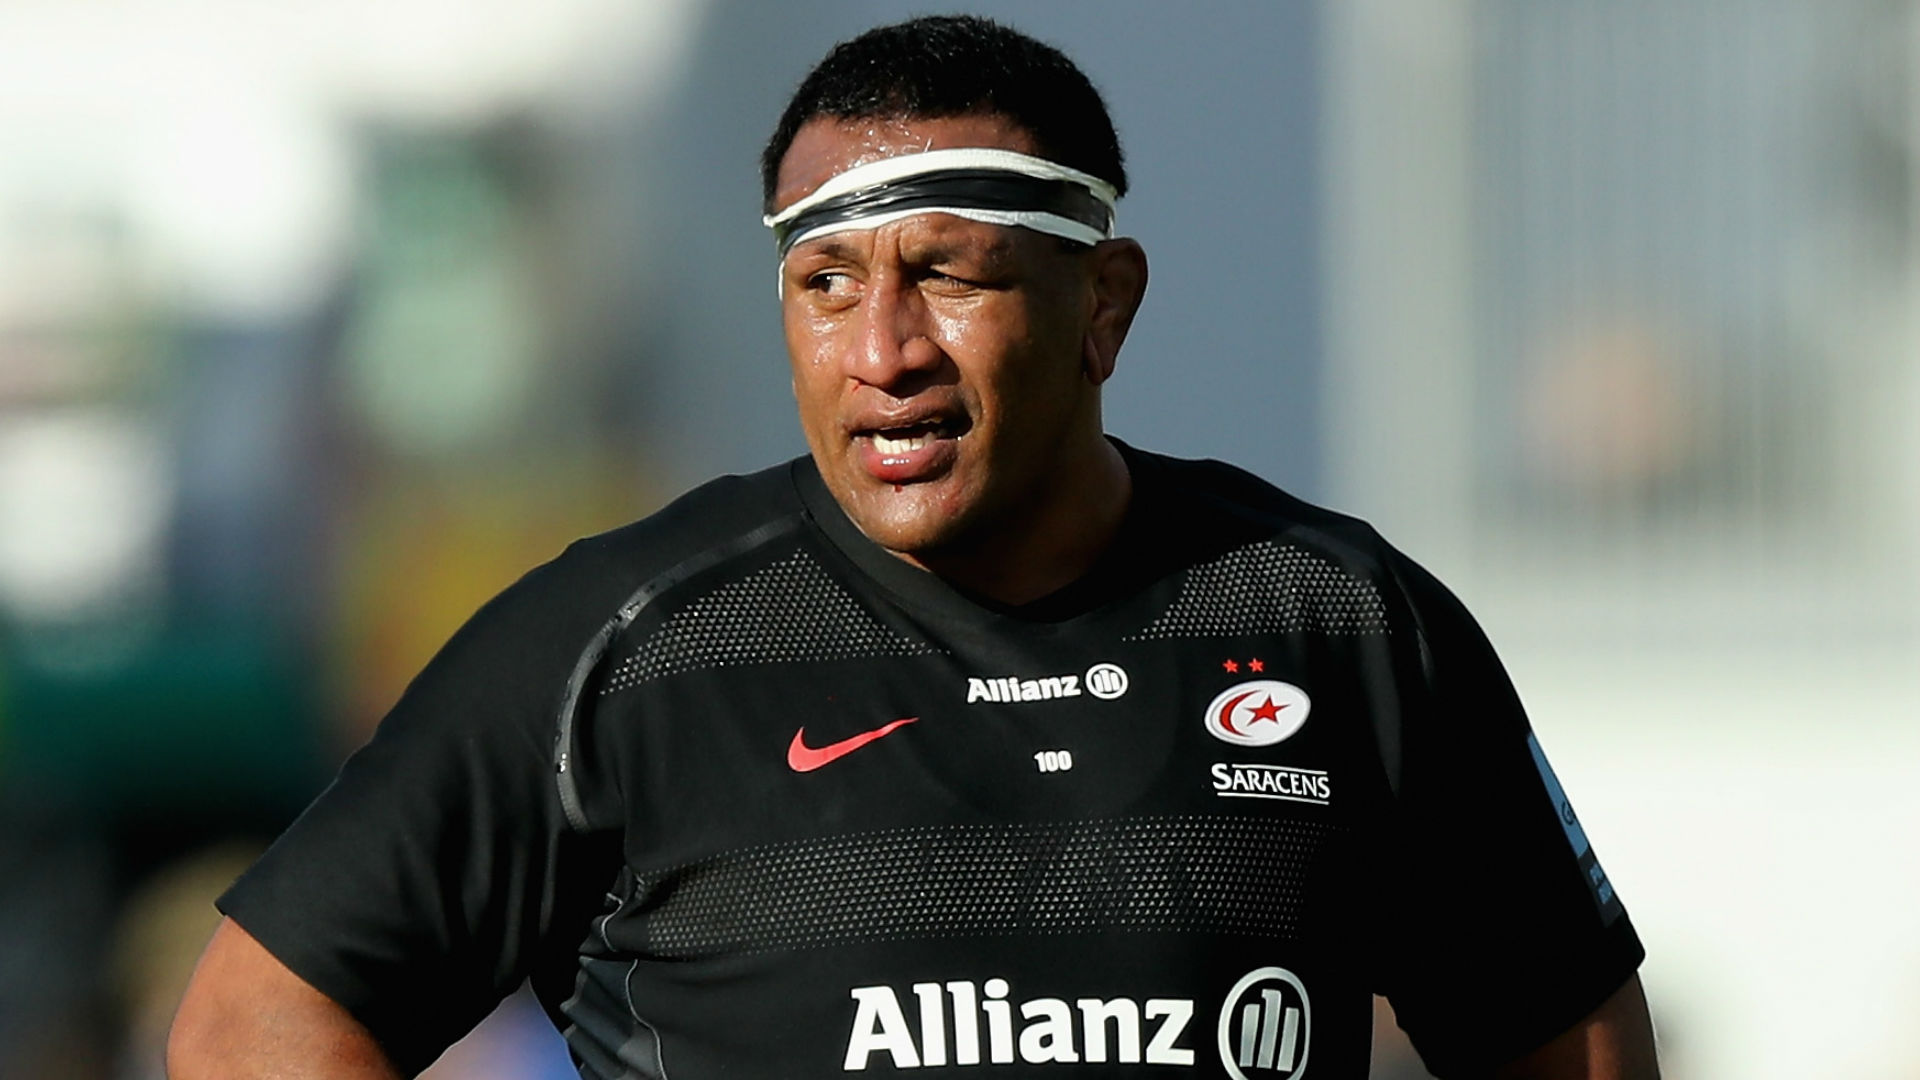 Saracens confirm Vunipola facing three months out